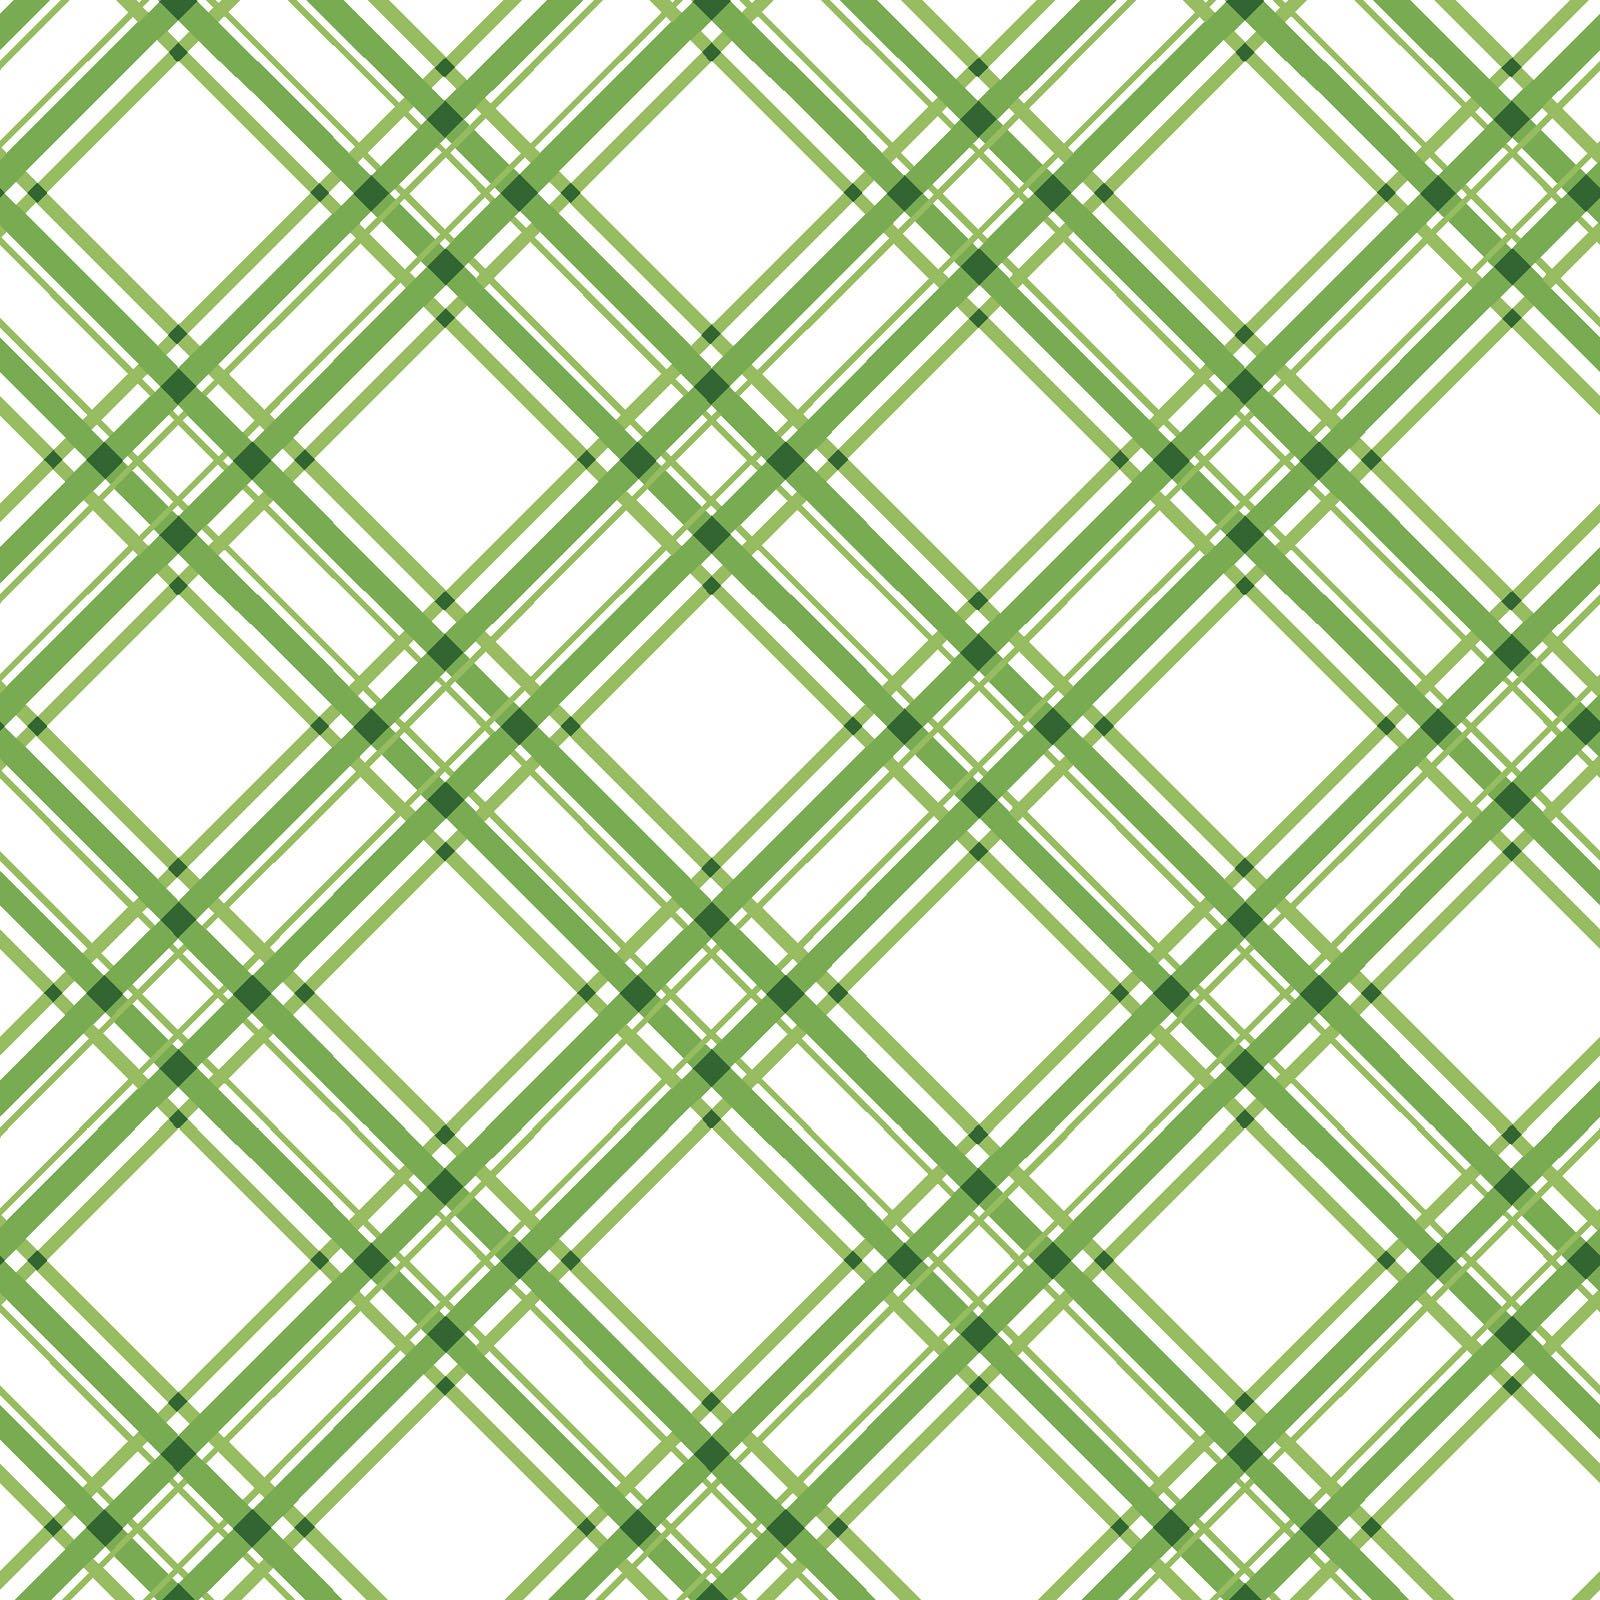 KimberBell Basics Green Diagonal Plaid 8244M-G